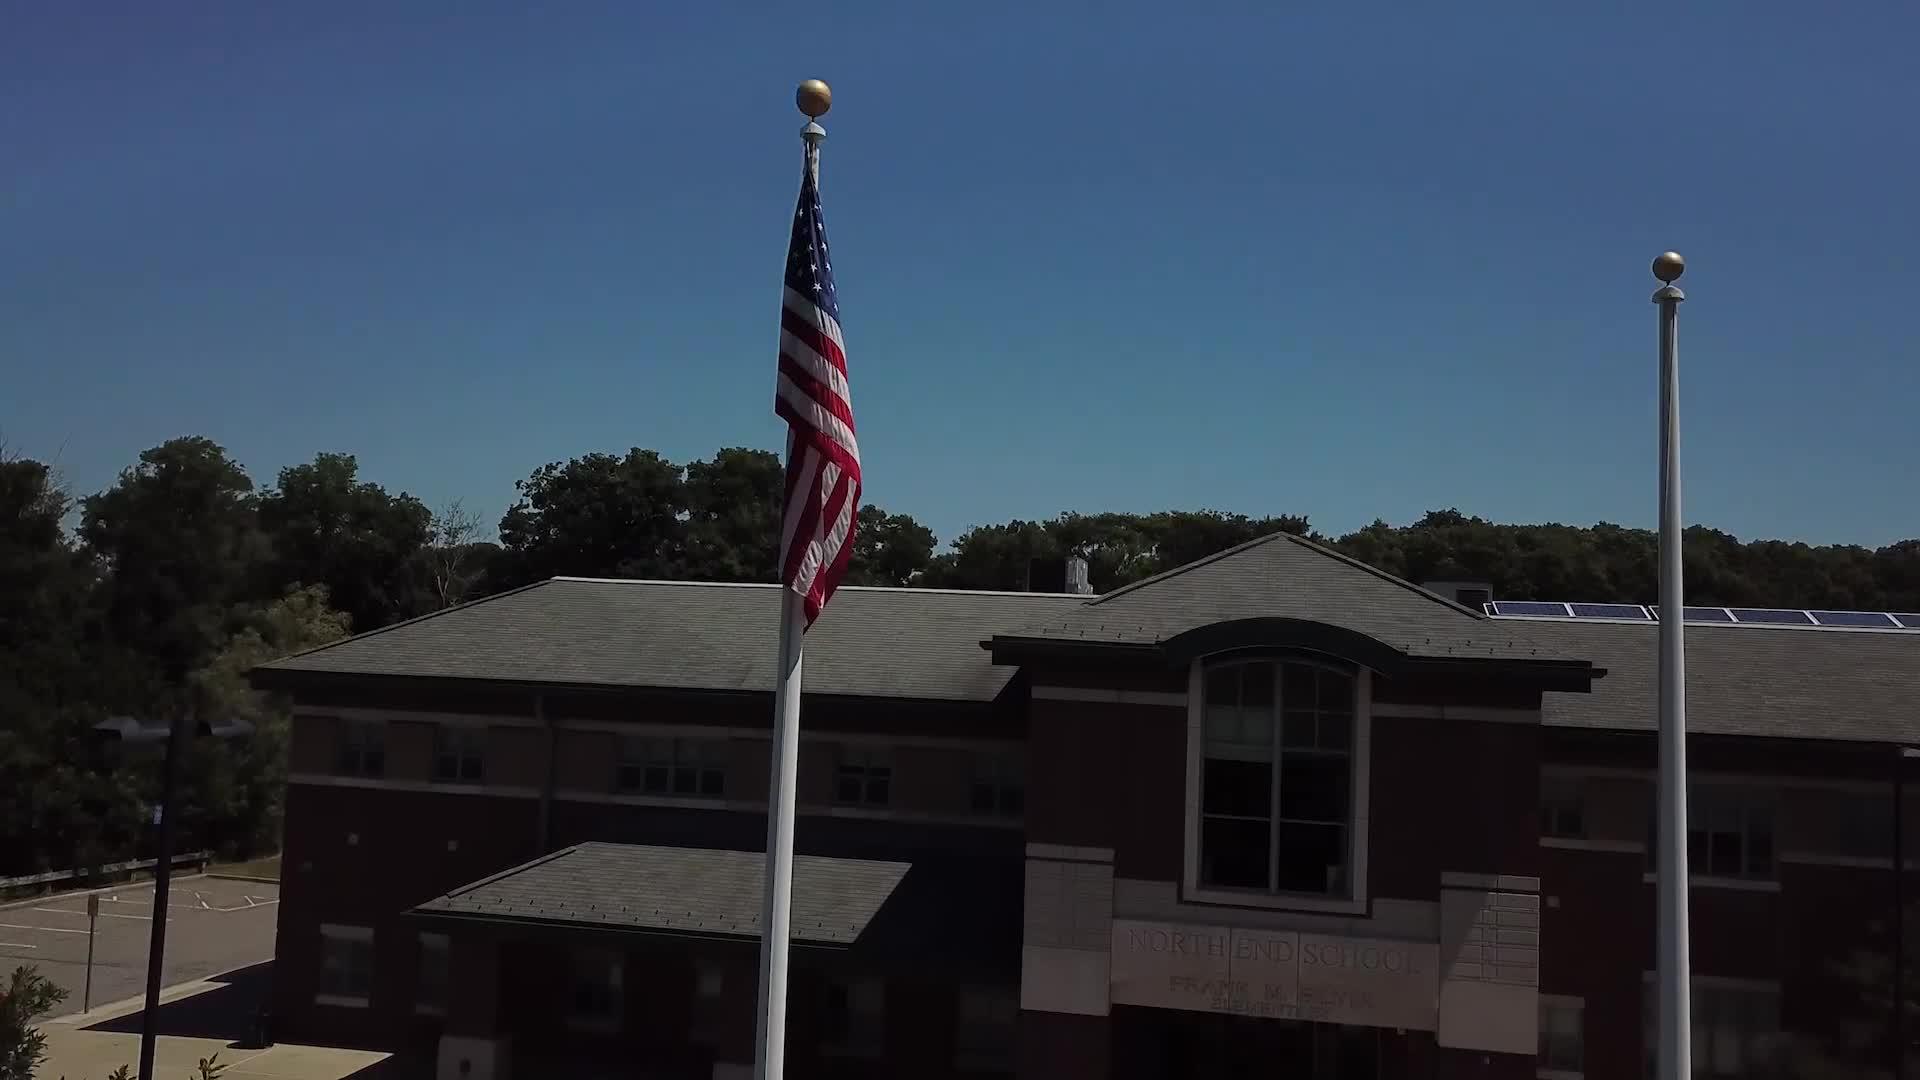 Frank M. Silvia Elementary School Home - Fall River Public Schools